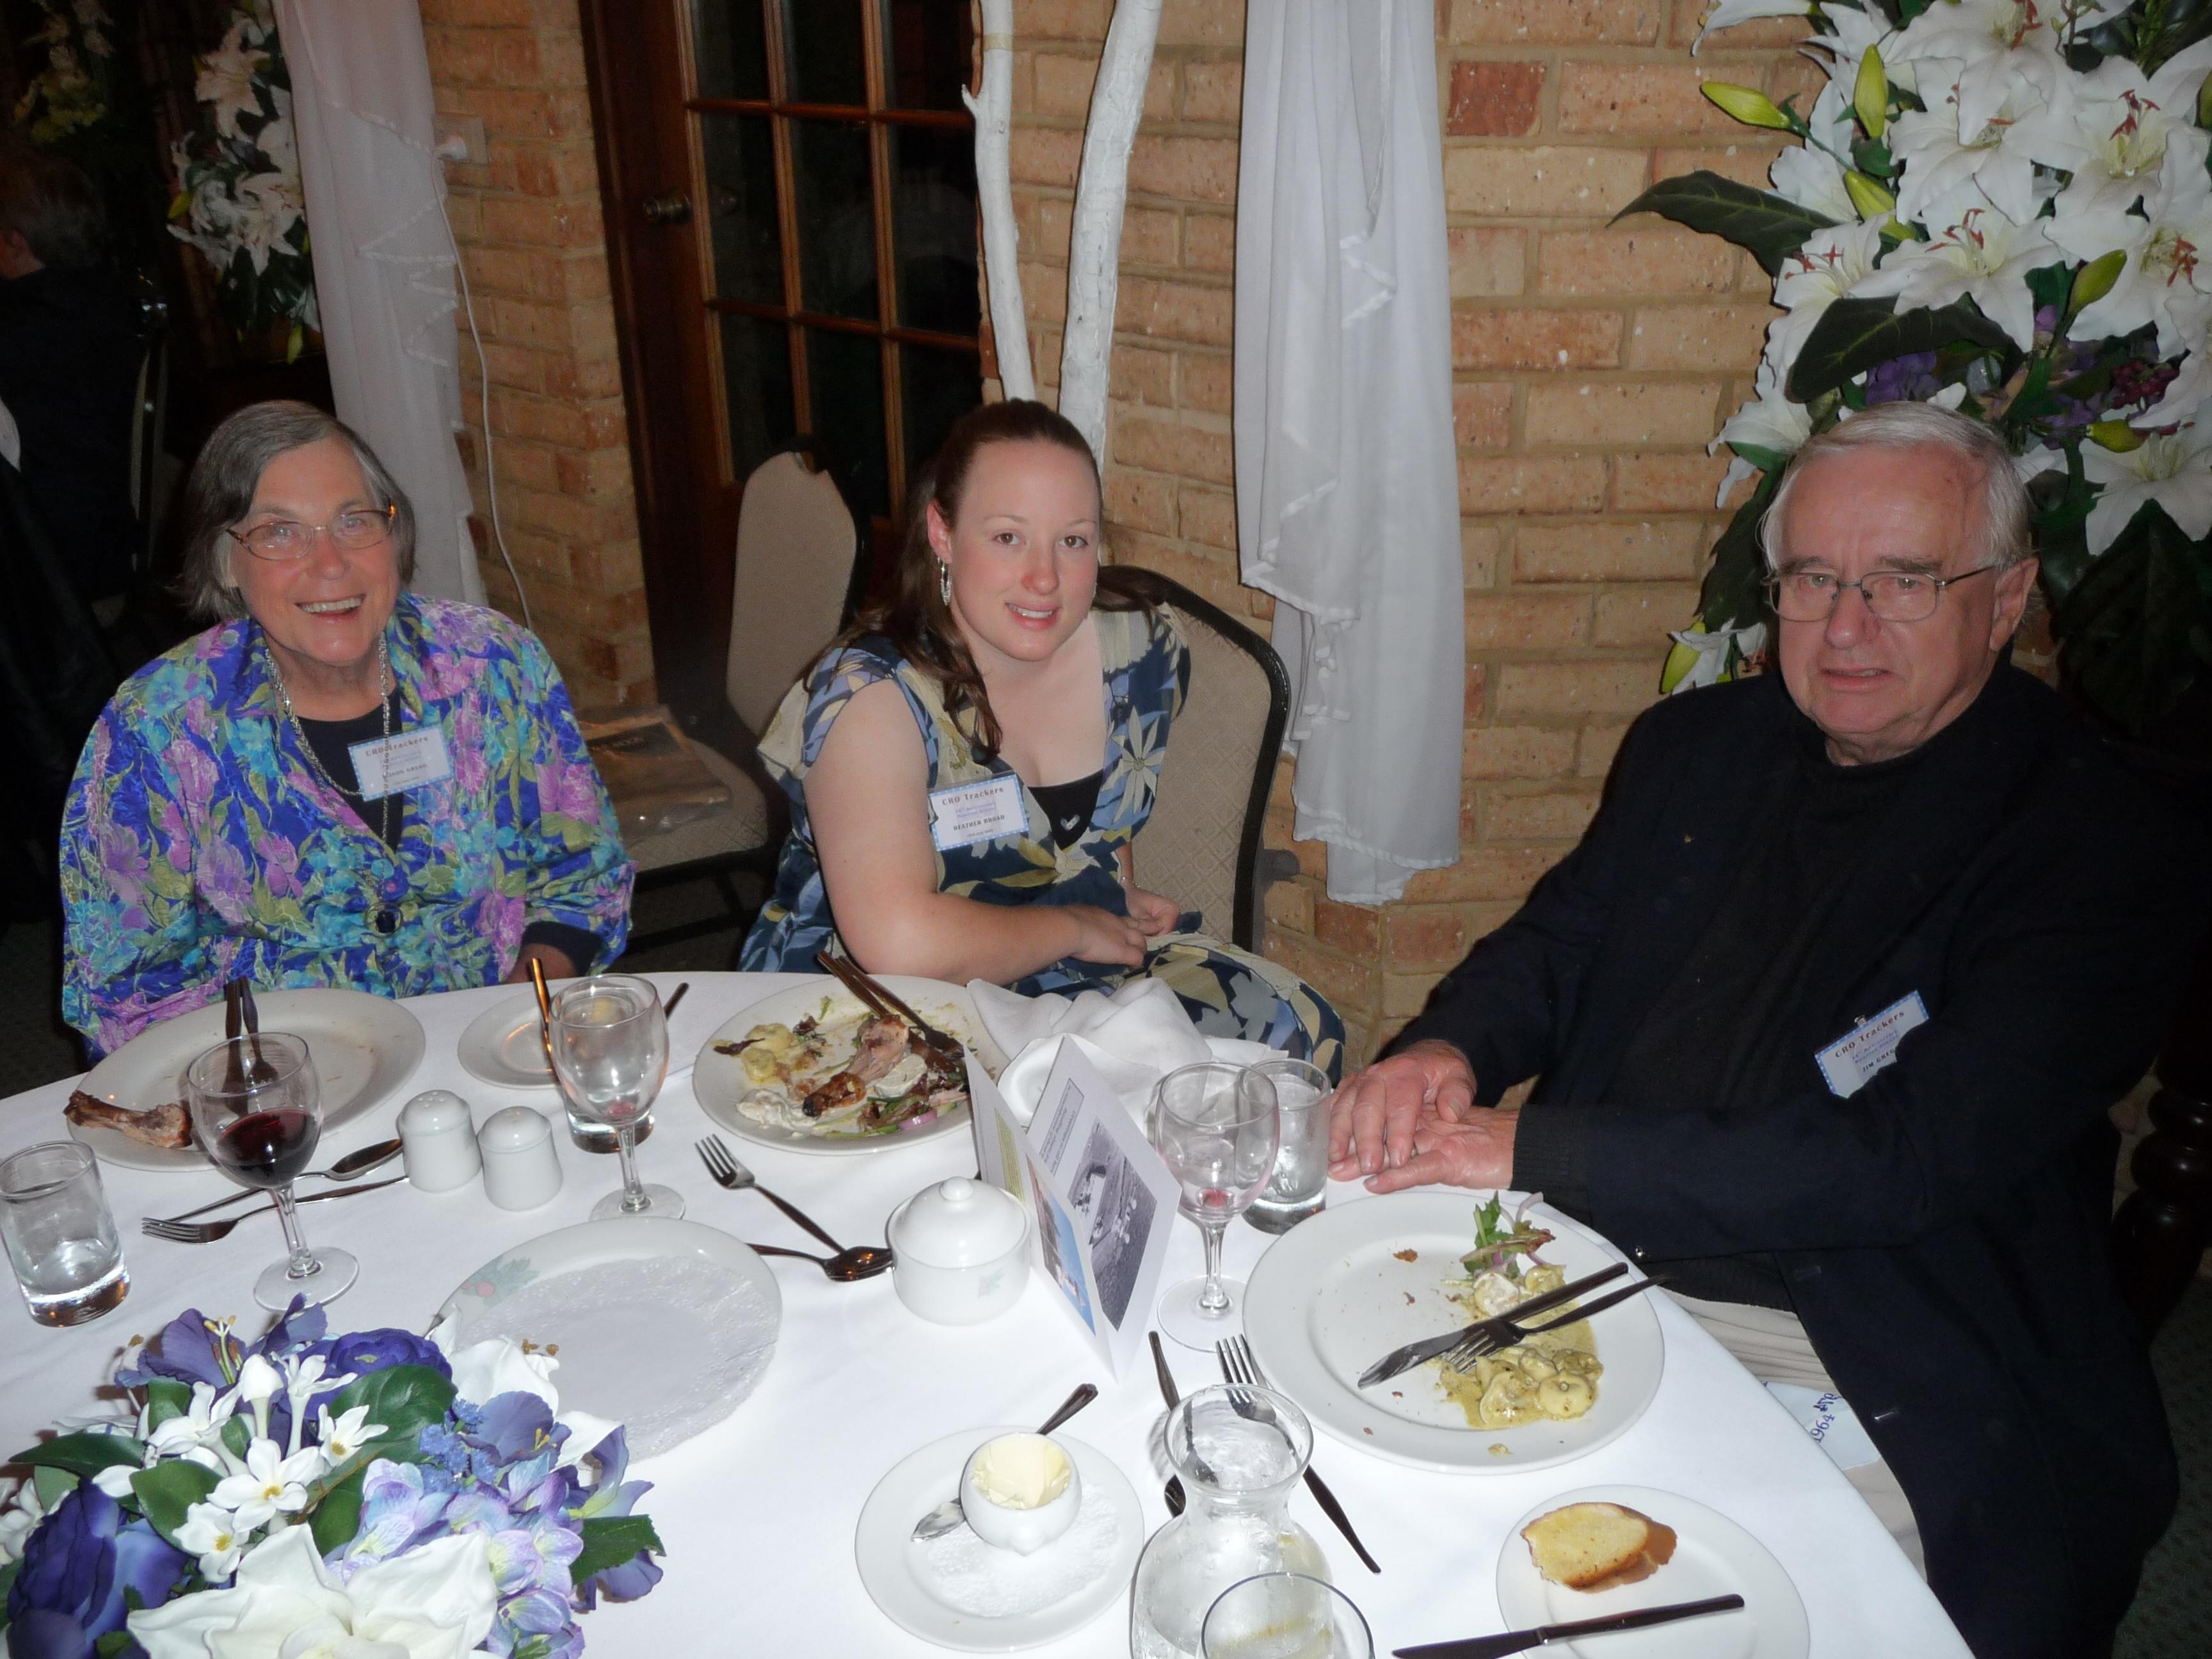 Alison Gregg, Heather Broad & Jim Gregg